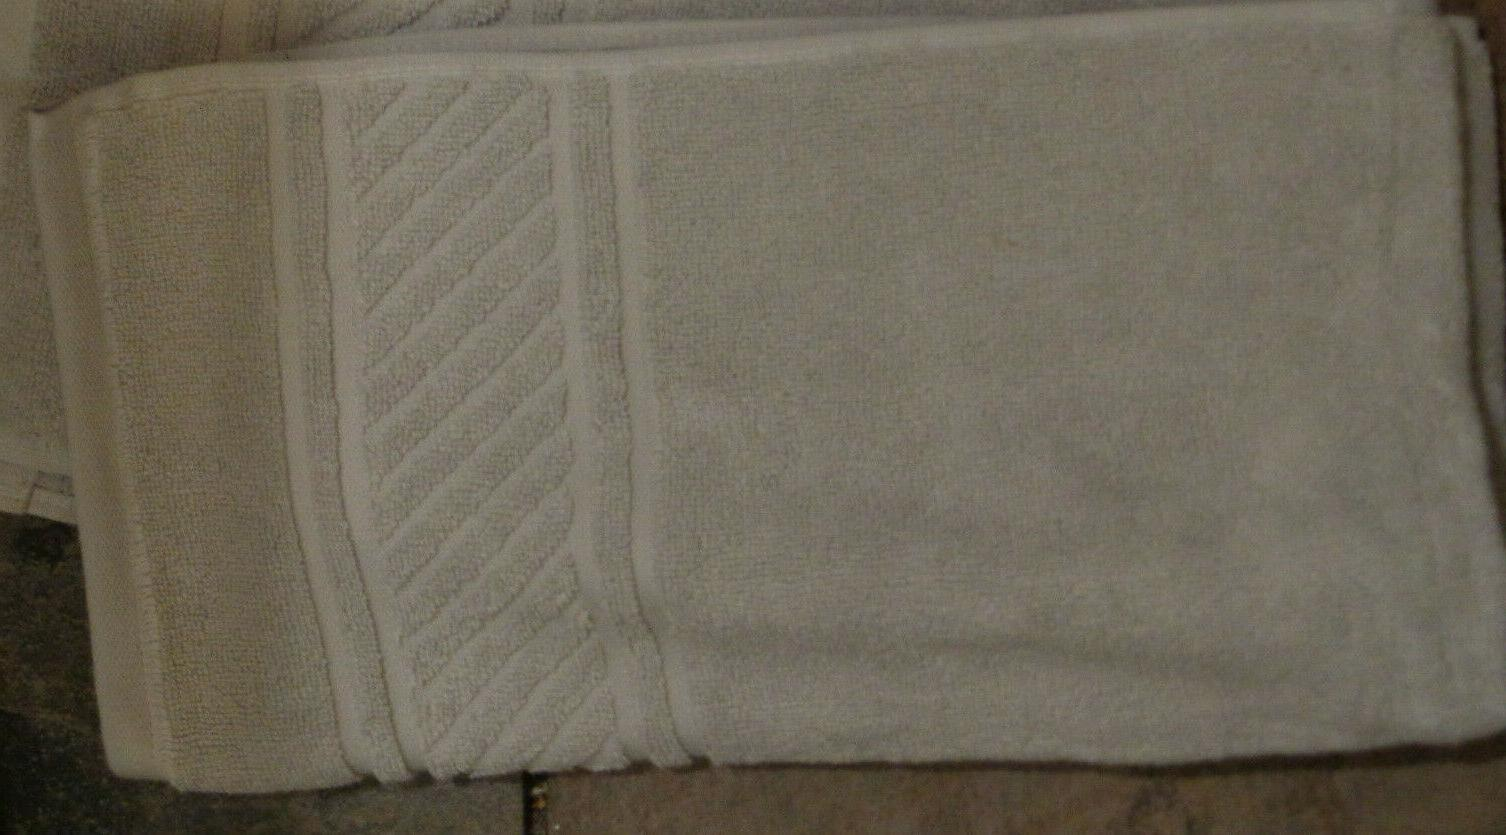 spa jacquard border silver pearl hand towel